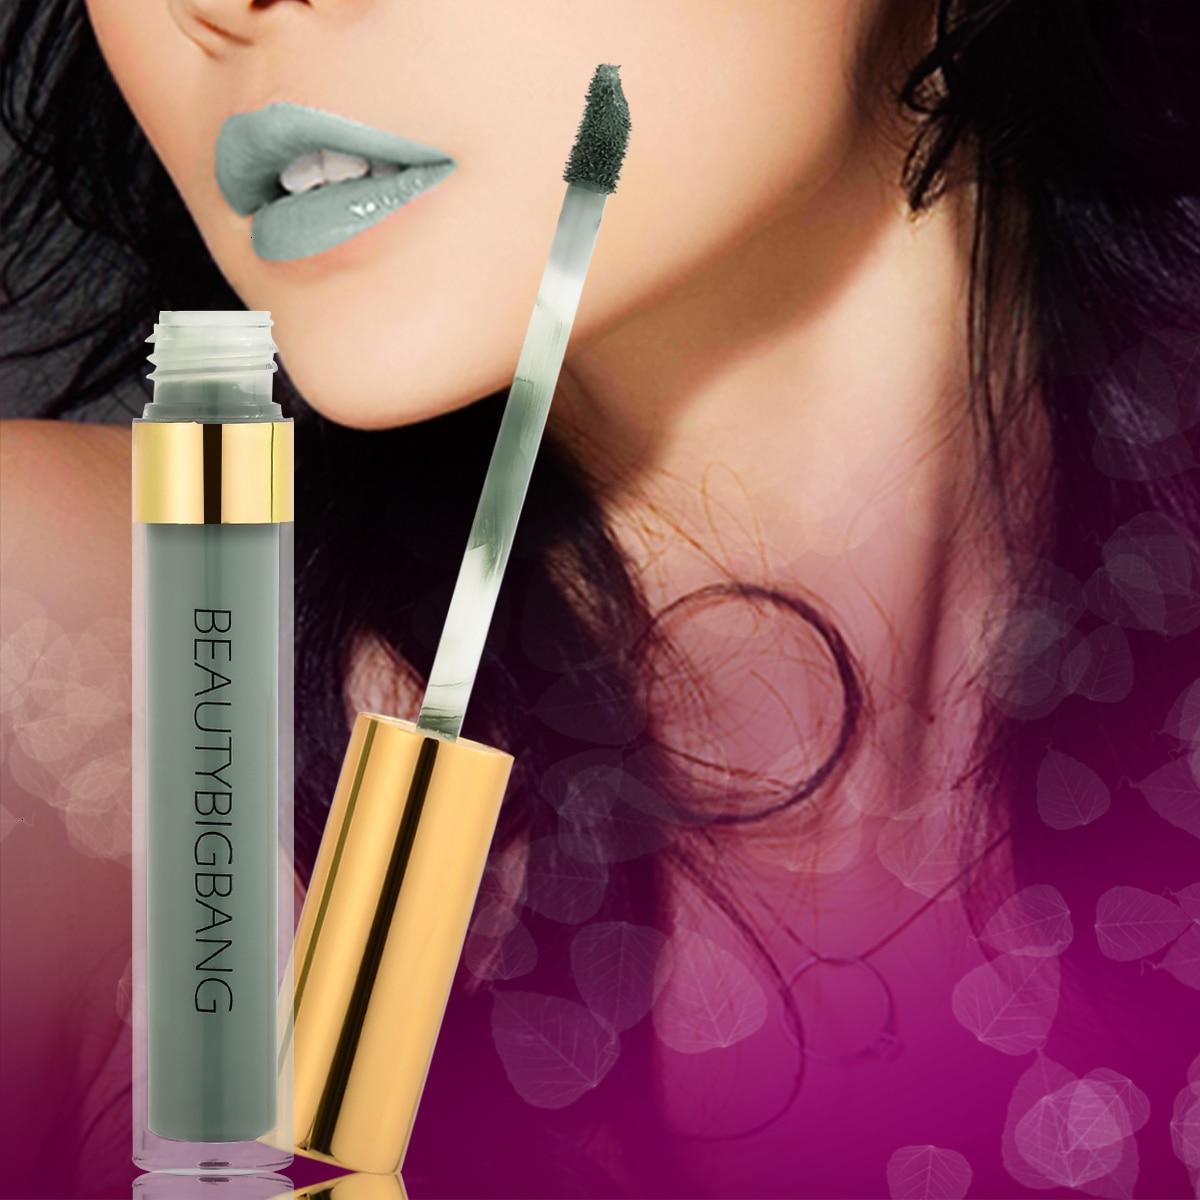 Beautybigbang Sexy colores brillo de labios líquido tubo pintura mate lápiz labial impermeable de larga duración Kit de lápiz labial